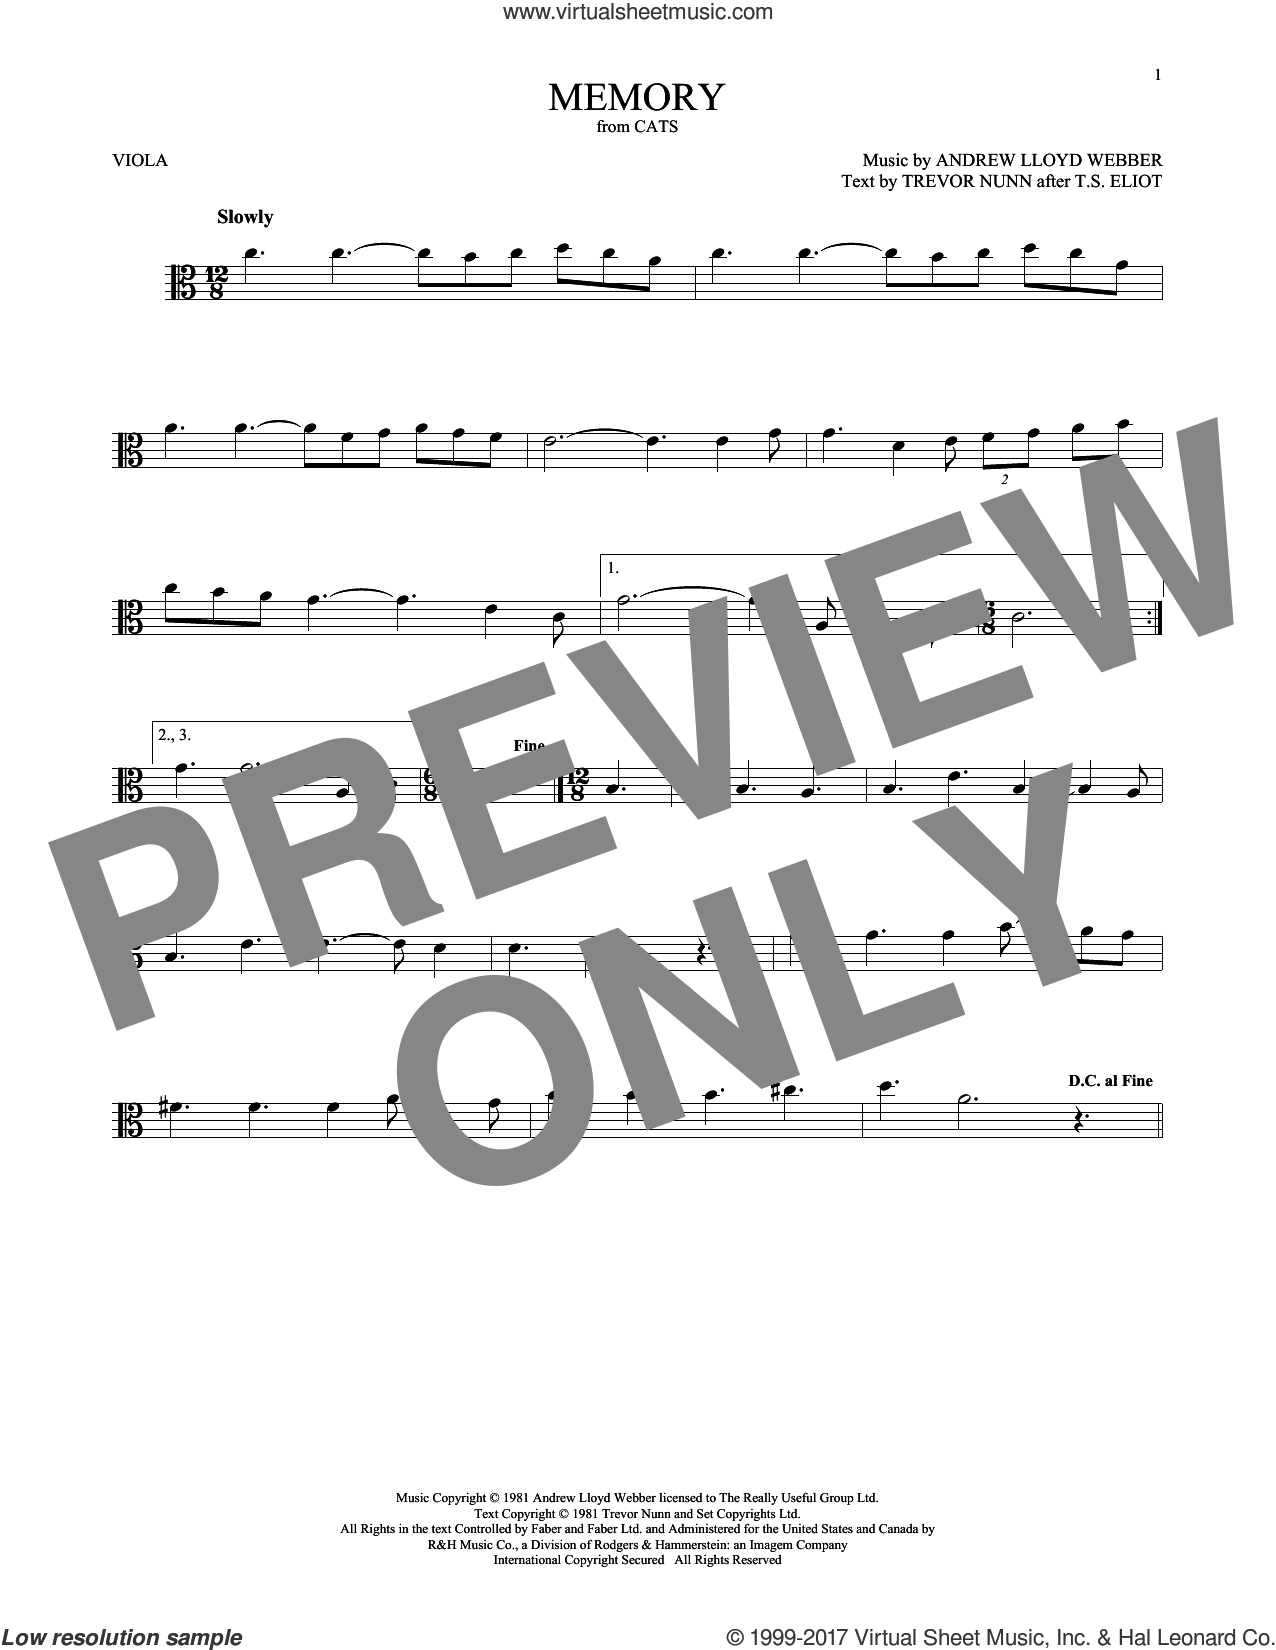 Memory (from Cats) sheet music for viola solo by Andrew Lloyd Webber, Barbra Streisand and Trevor Nunn, intermediate skill level